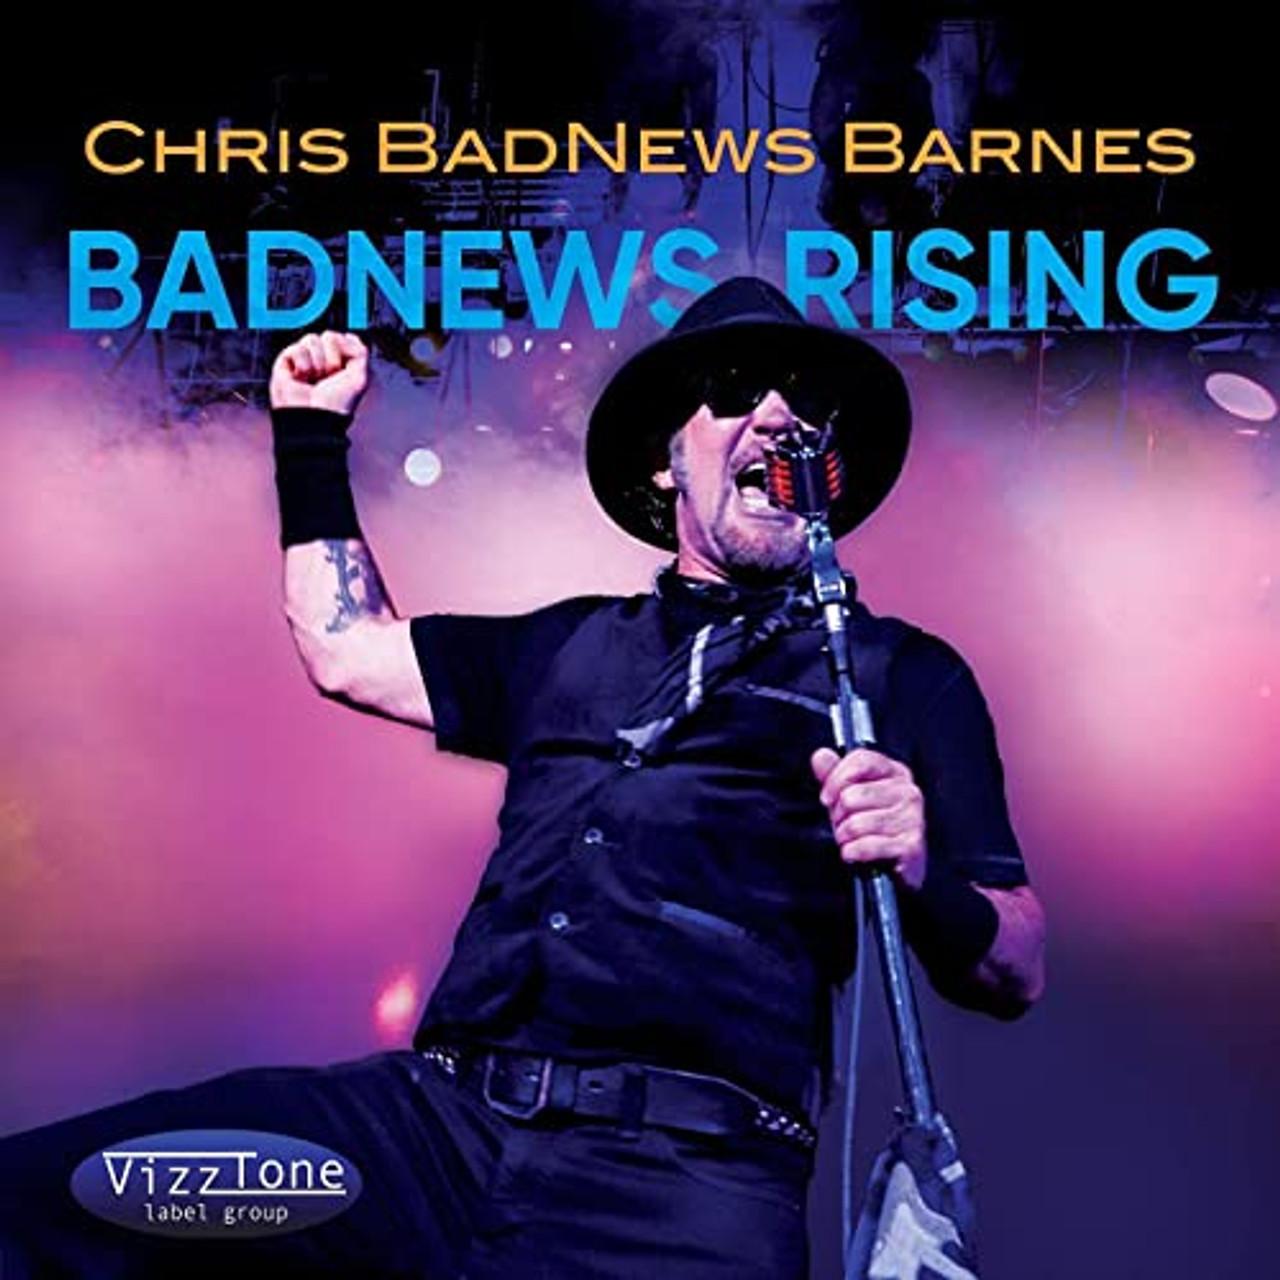 CHRIS BARNES - BADNEWS RISING